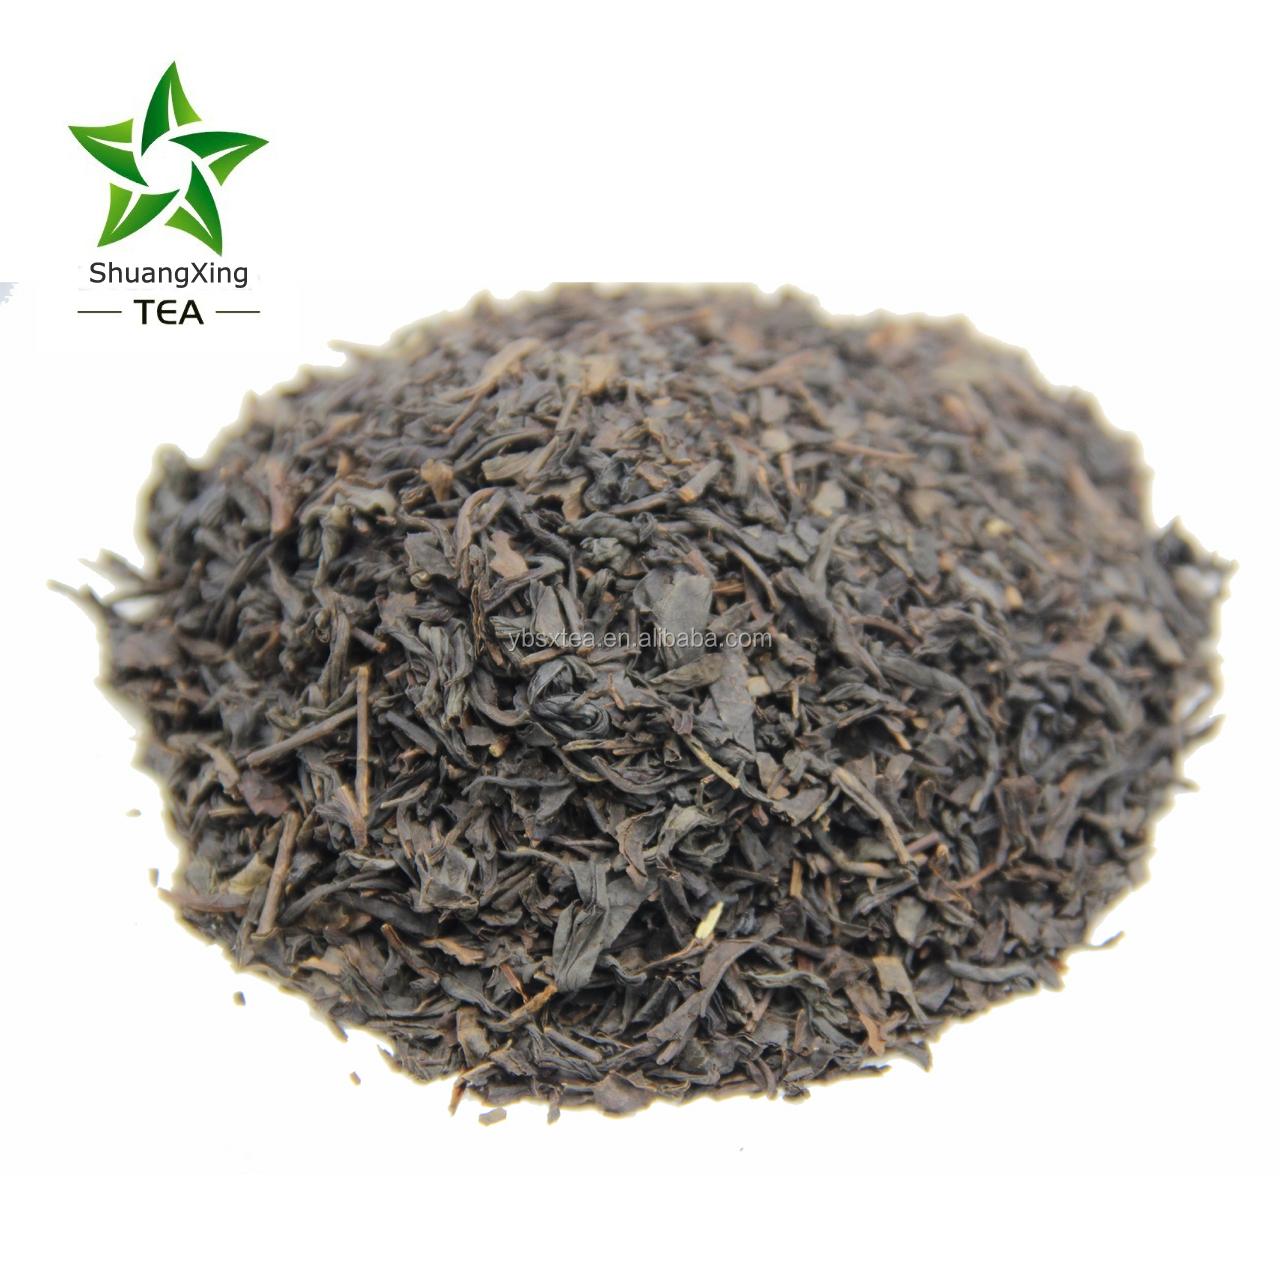 Black tea for Mideast China black tea wxport to Mideast hotsale black tea cheap price